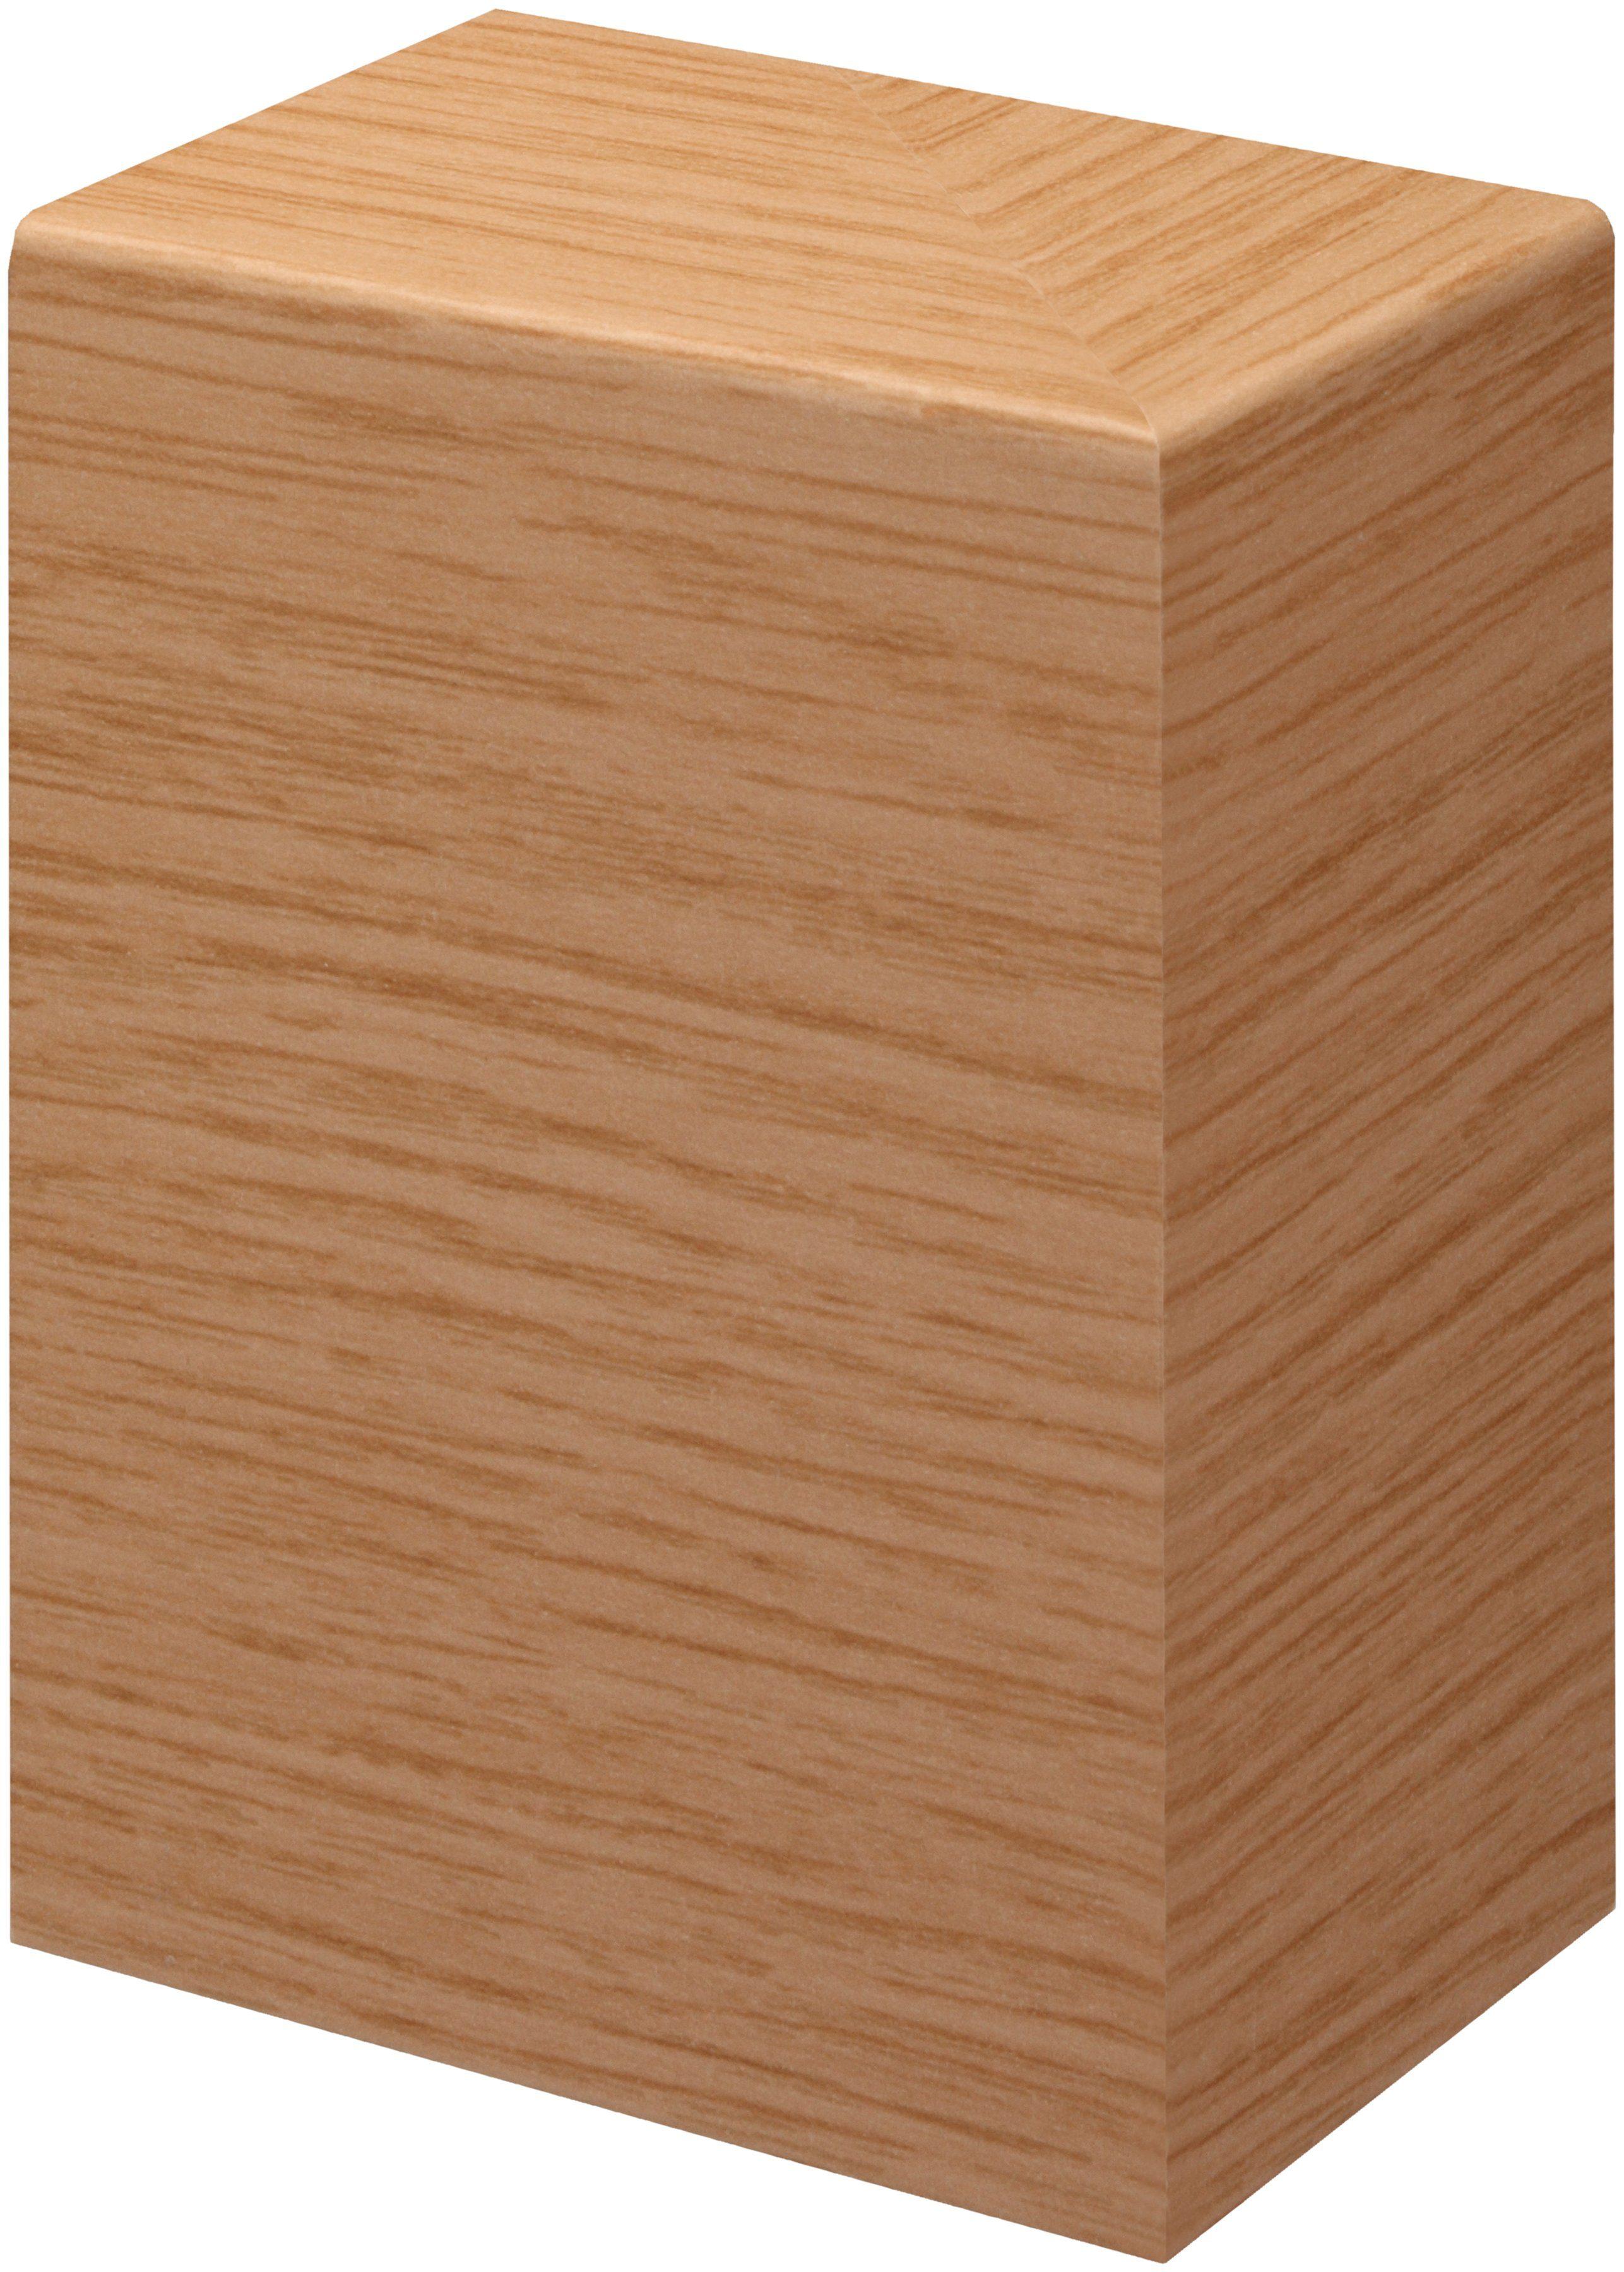 BODENMEISTER Set: Endkappe »Rohrabdeckleiste Eiche«, 2er-Pack (1x rechts, 1x links), Höhe: 10 cm